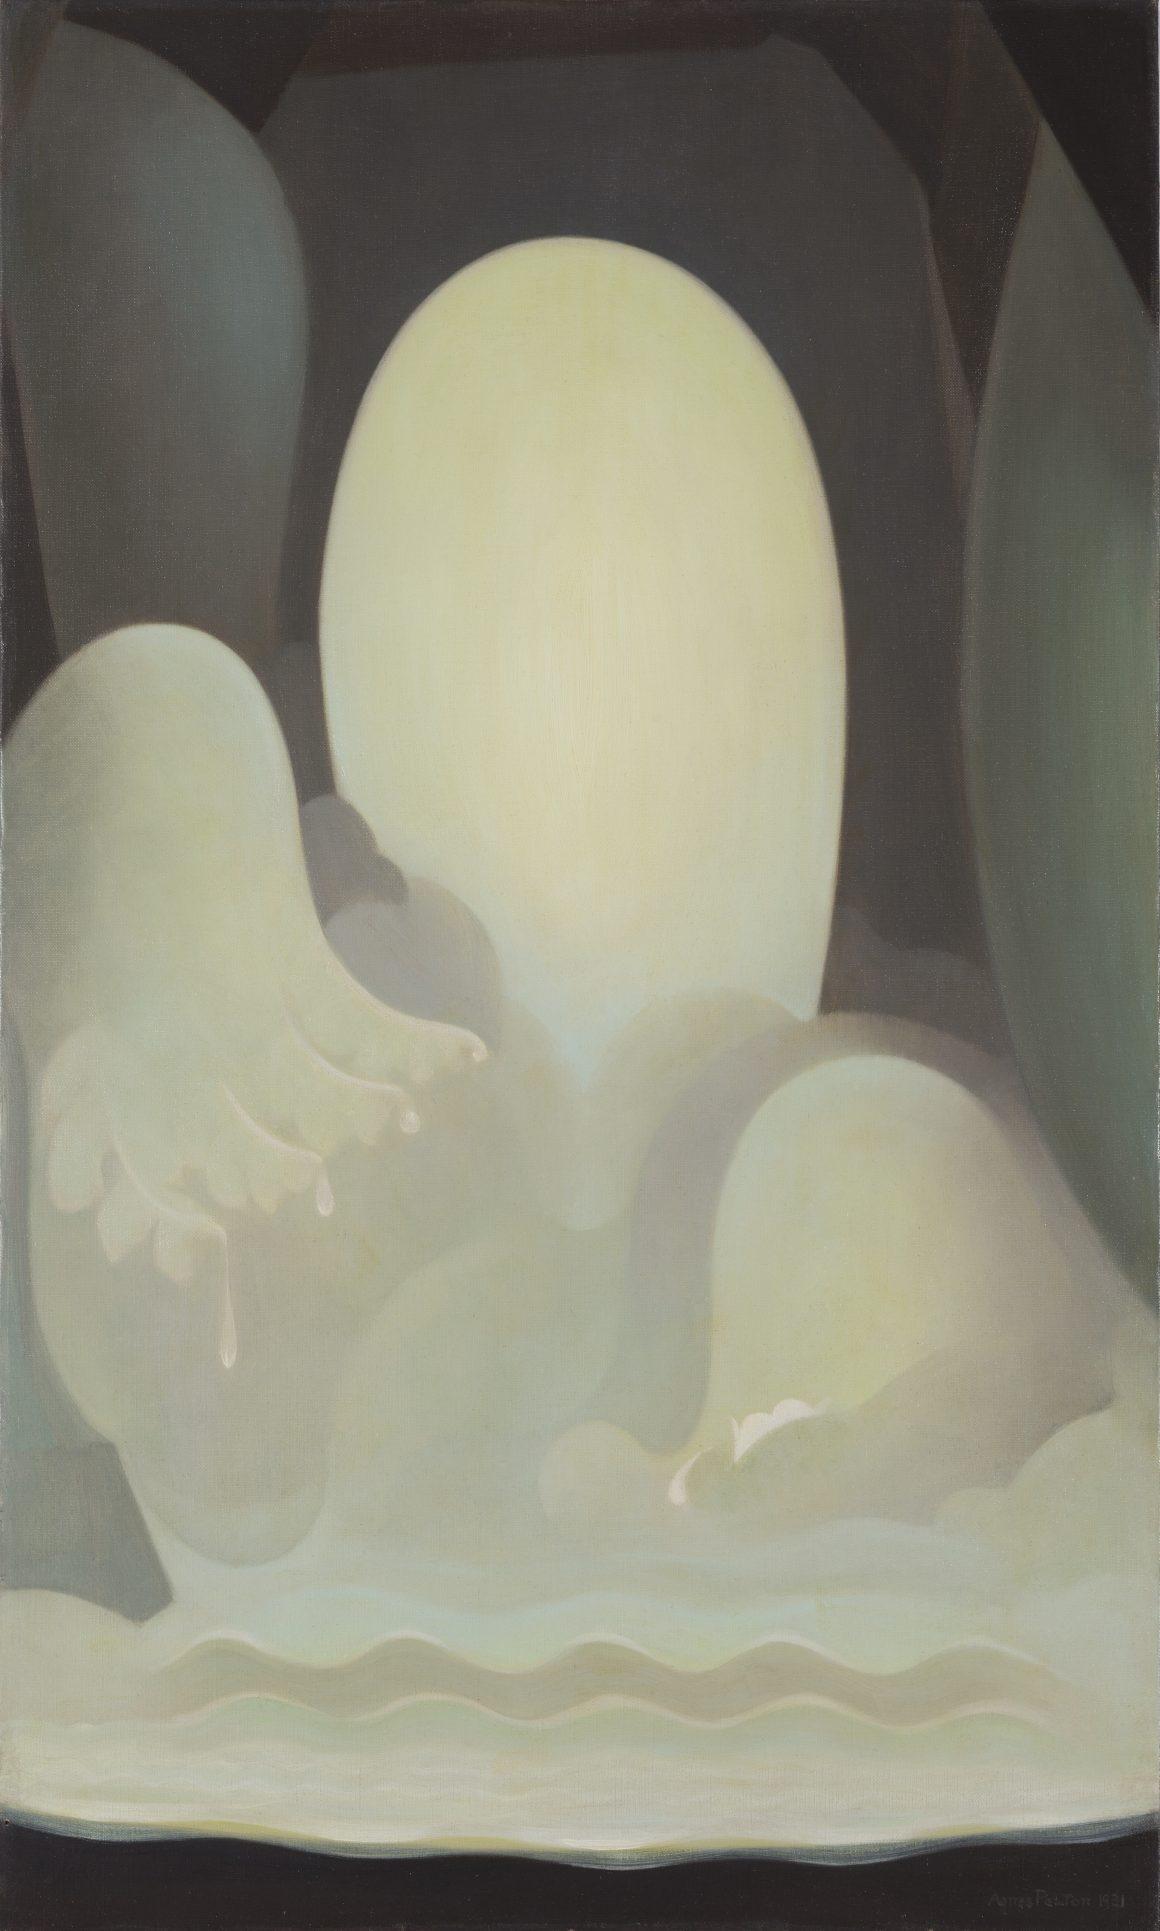 Agnes Pelton, Wells of Jade, 1931, Oil on canvas, Bequest of Raymond Jonson, Raymond Jonson Collection